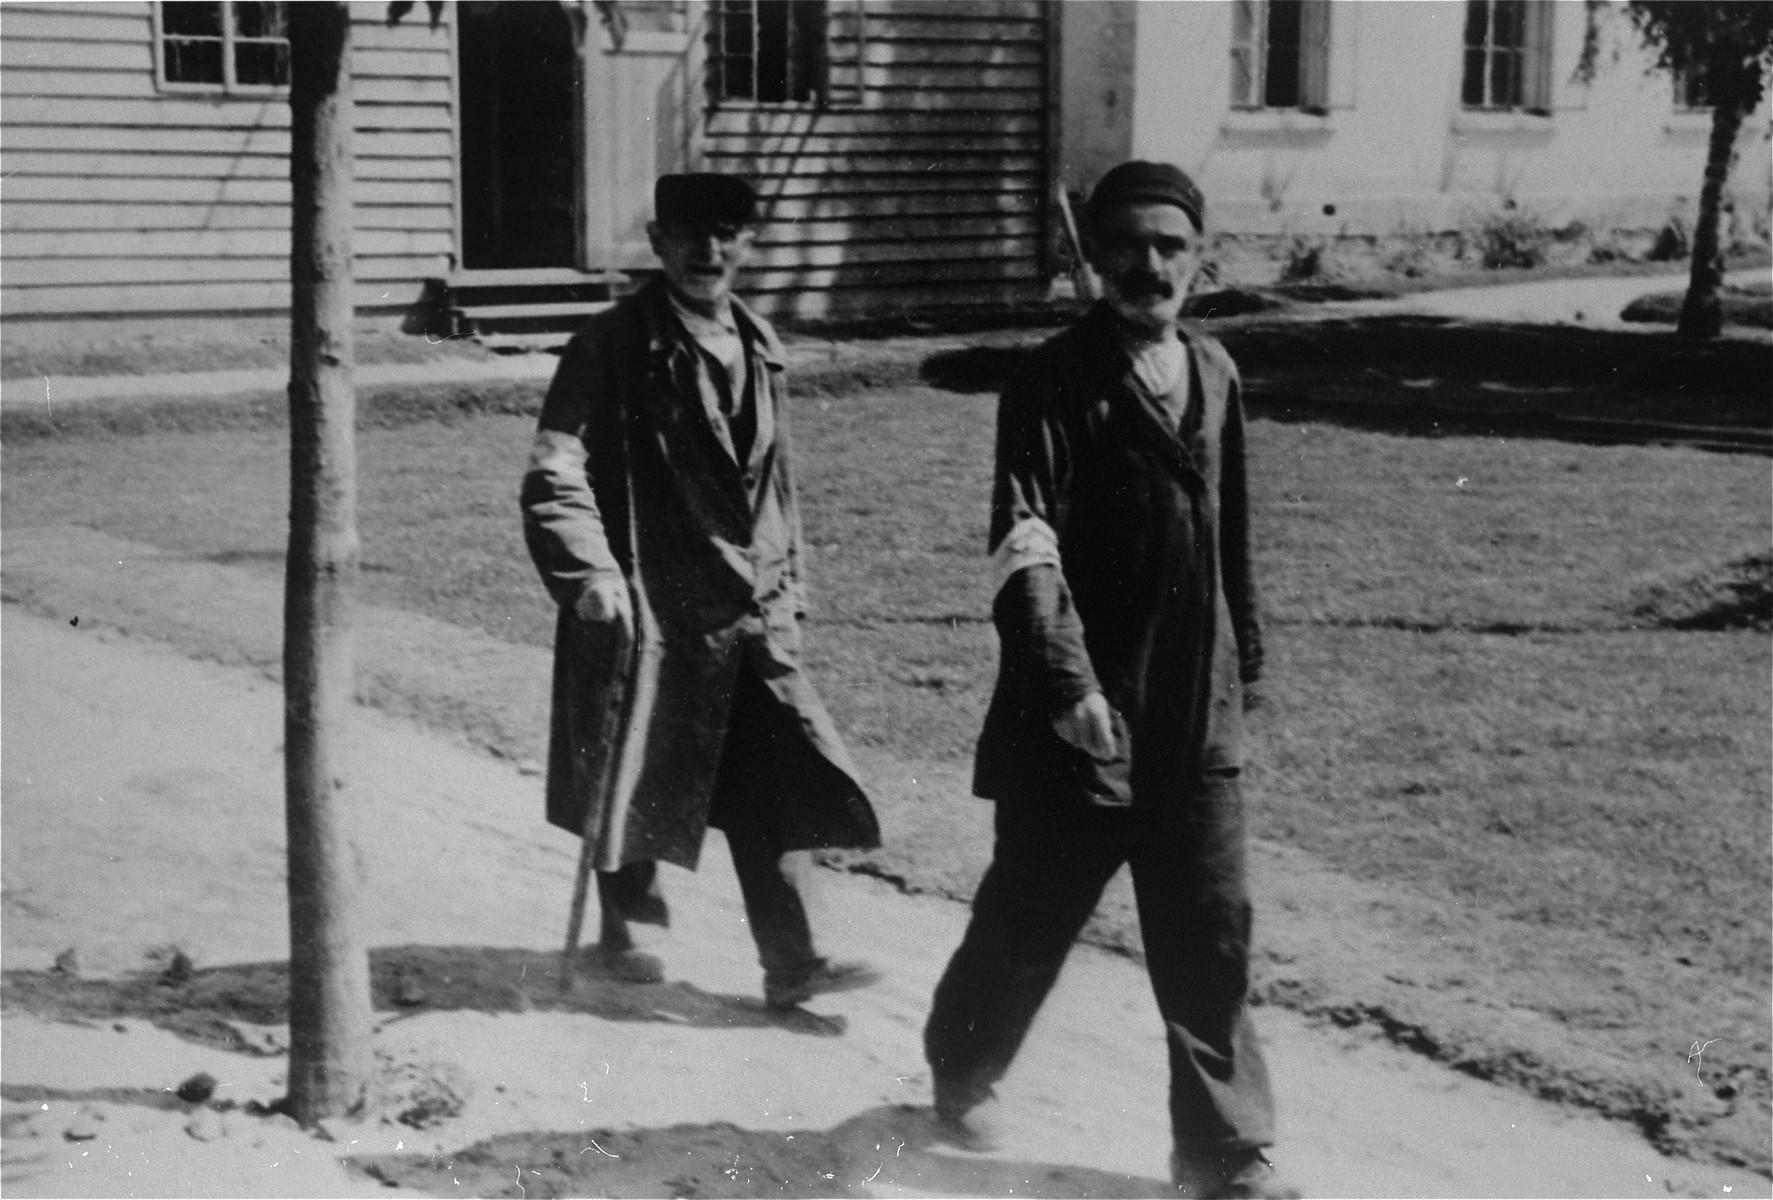 Two Jewish men wearing armbands walk along a path in Konskowola.